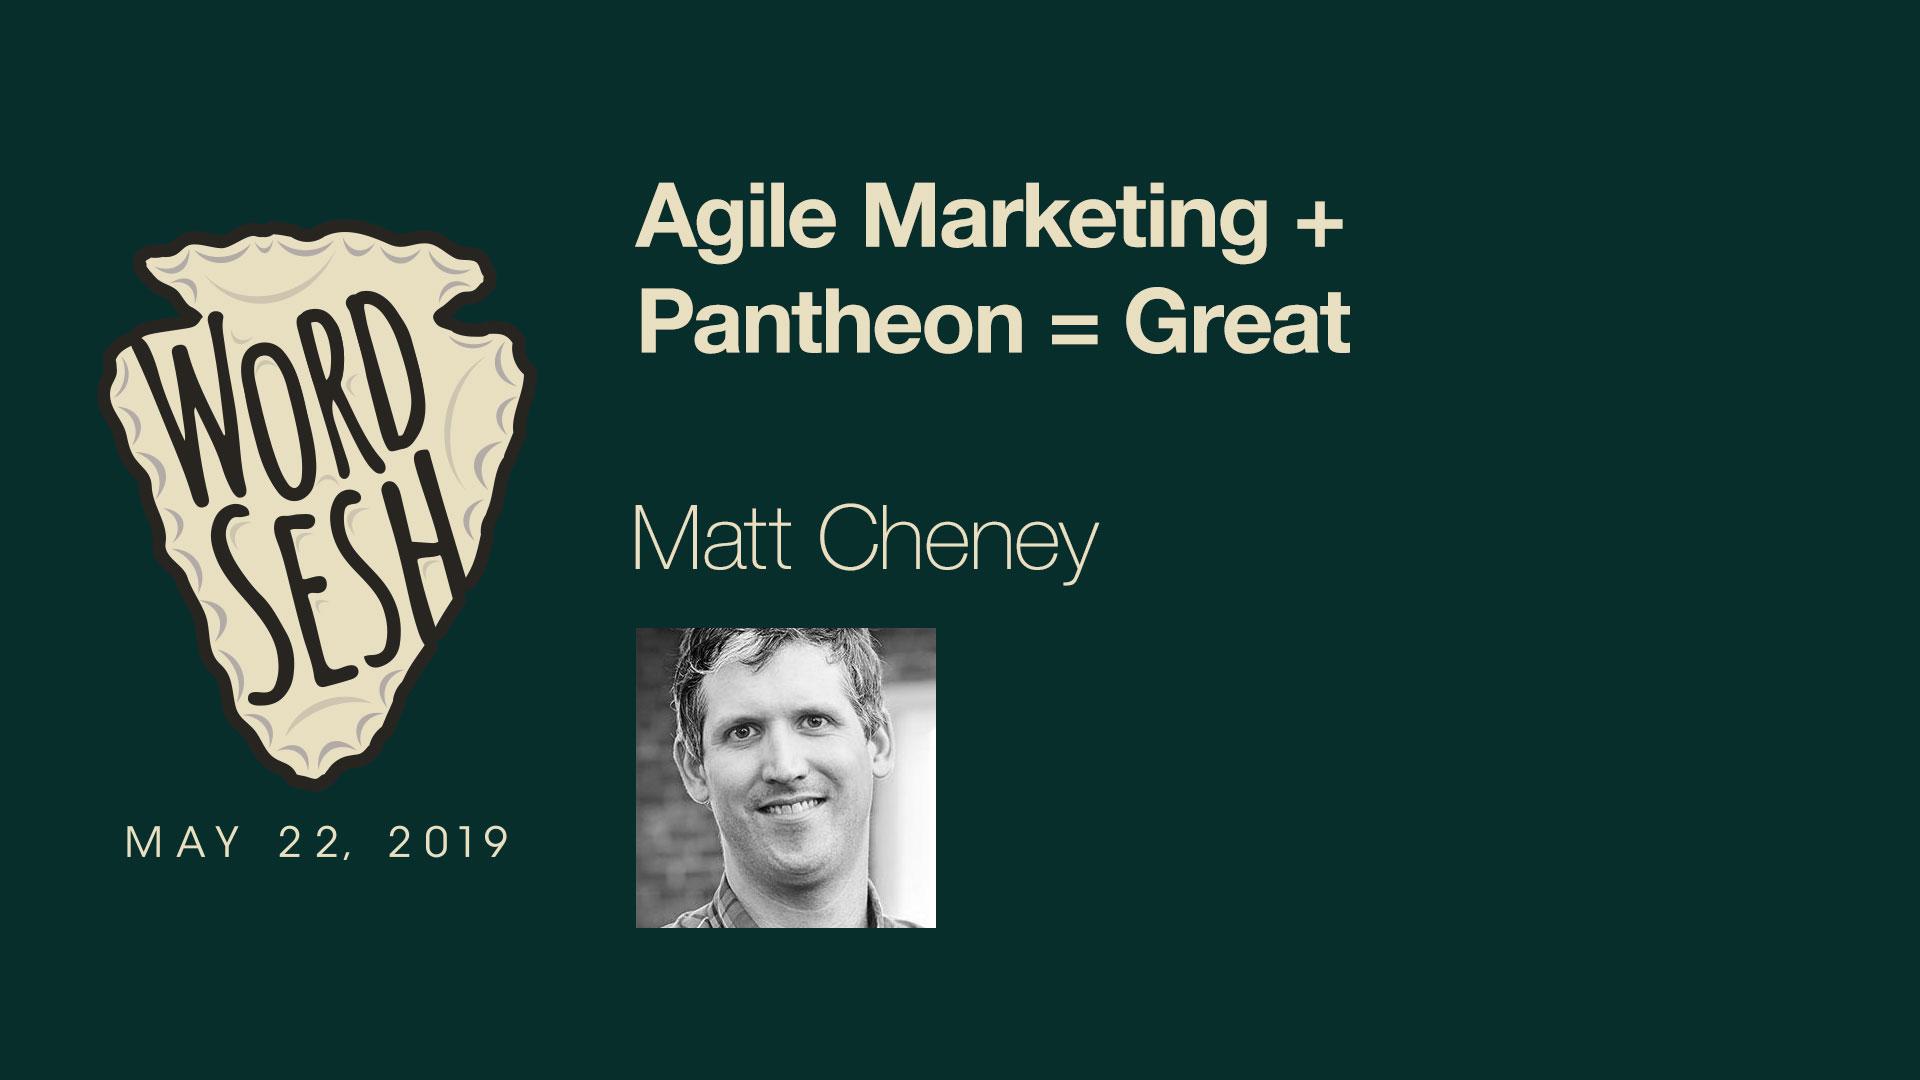 03-WordSesh-Agile-Marketing-Pantheon-Matt-Cheney